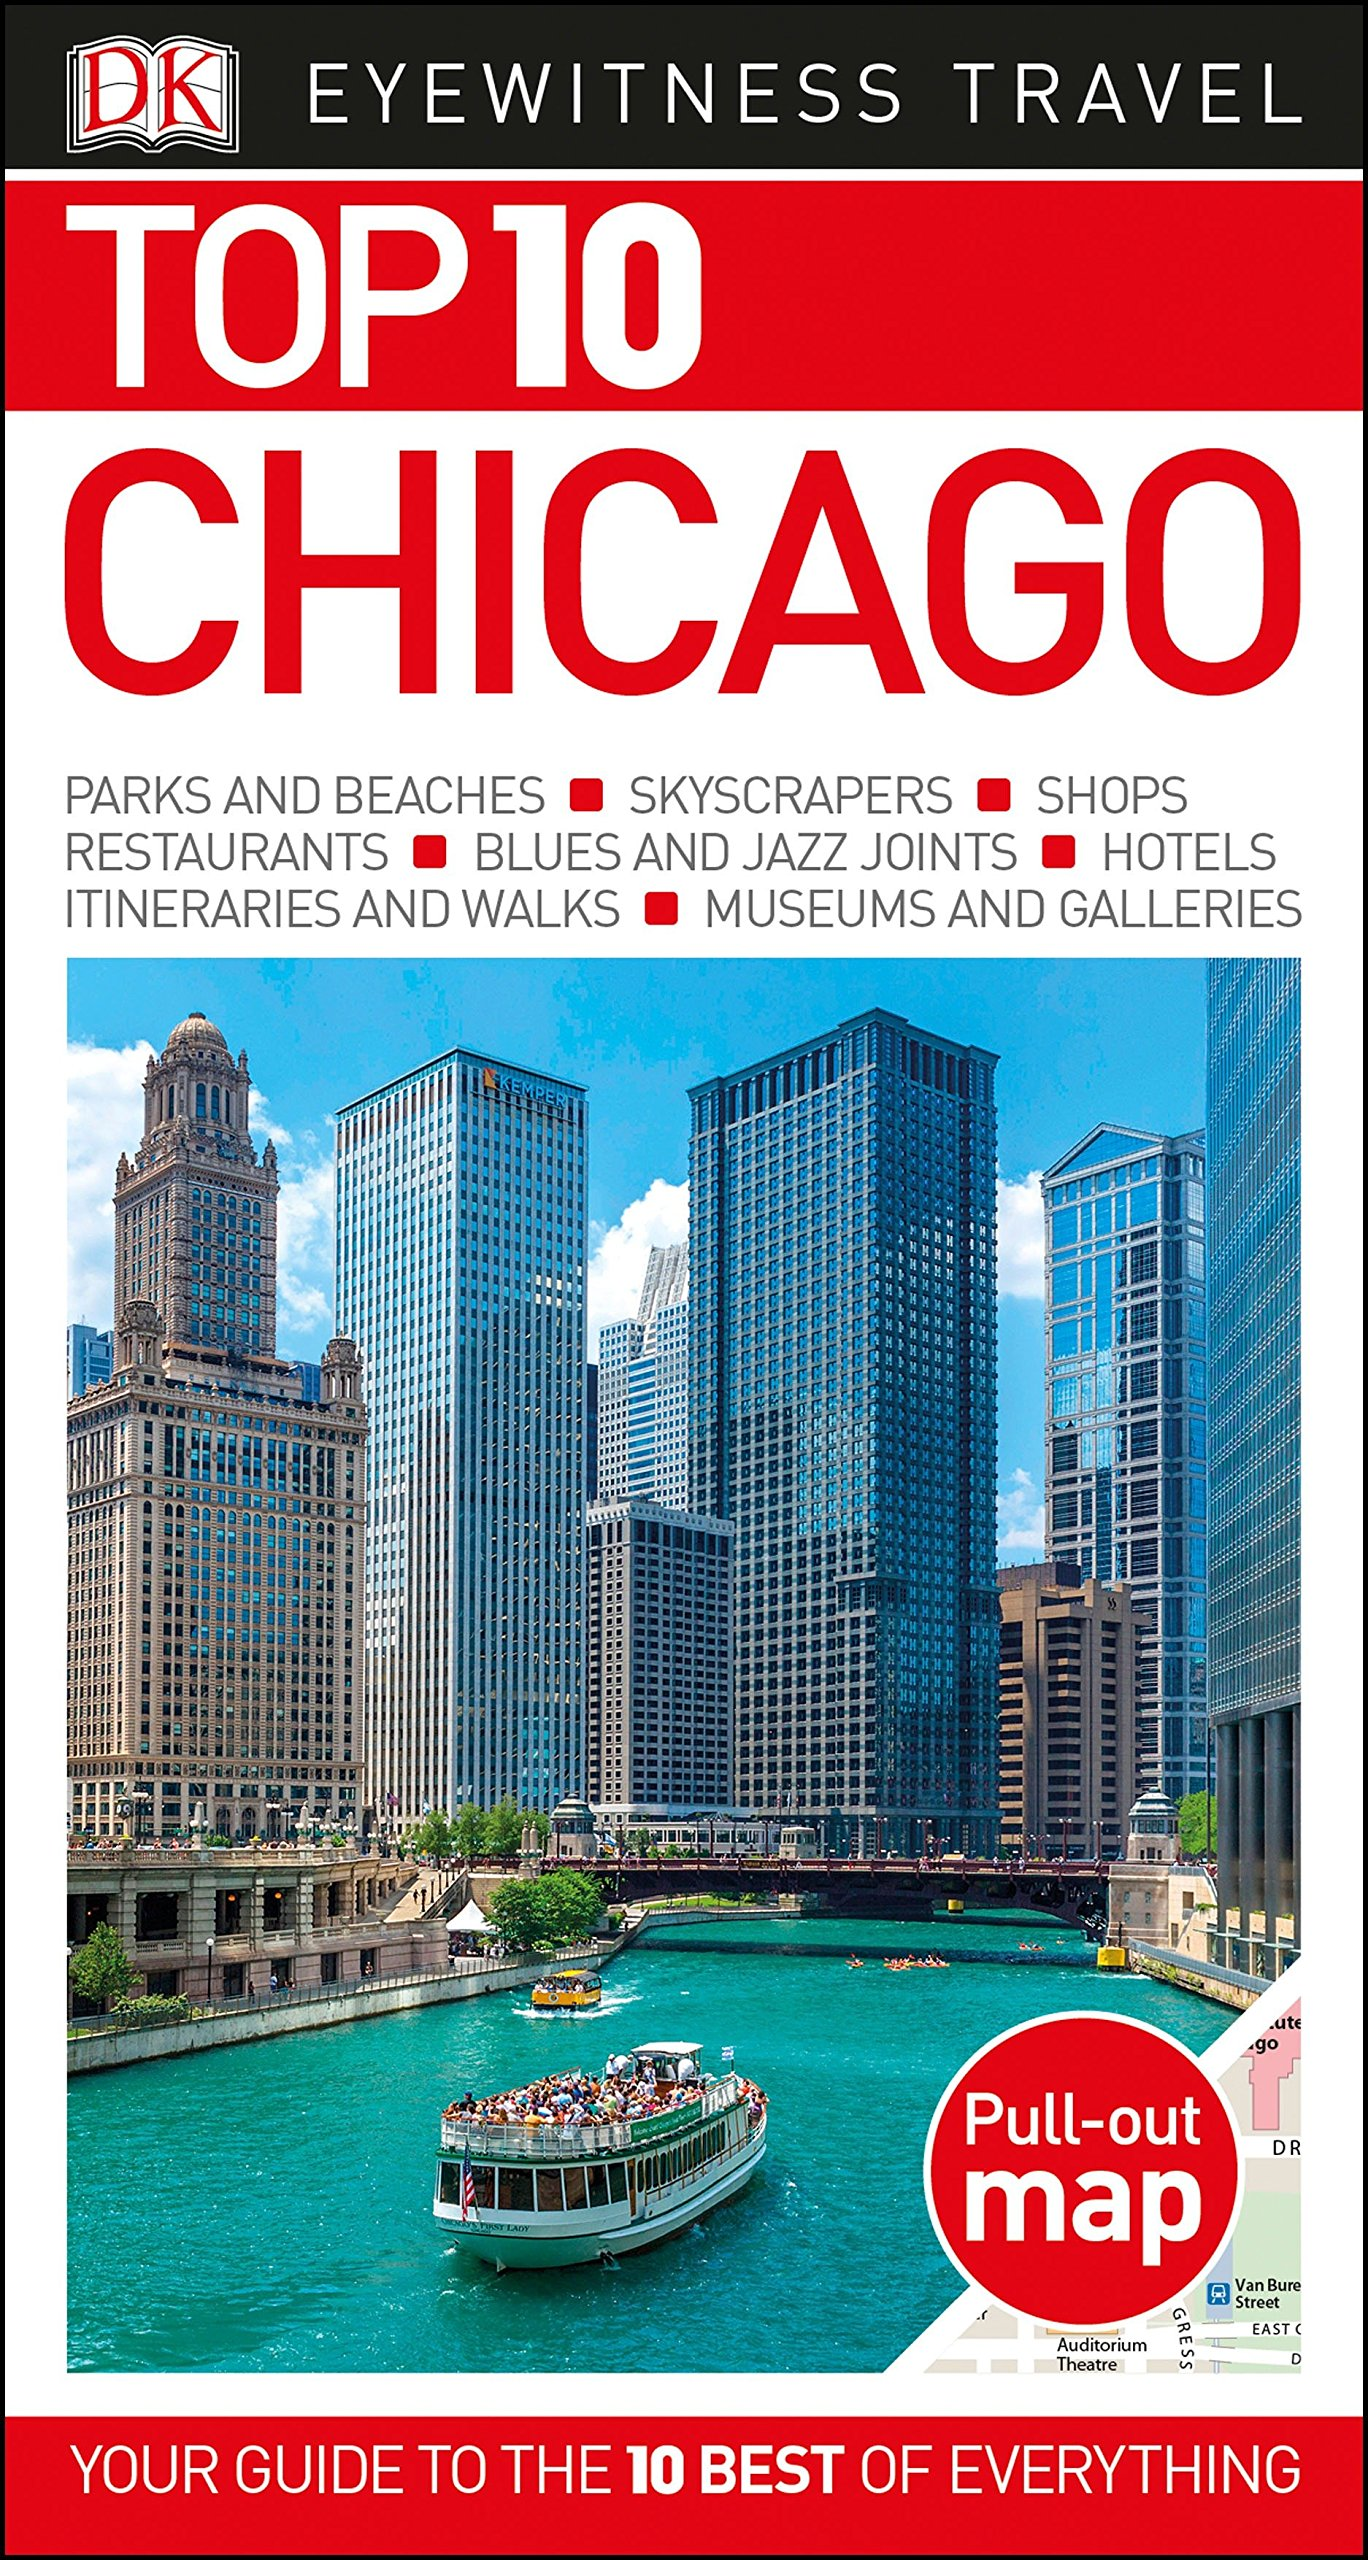 ccbdb0e520c Top 10 Chicago (DK Eyewitness Travel Guide)  DK Travel ...